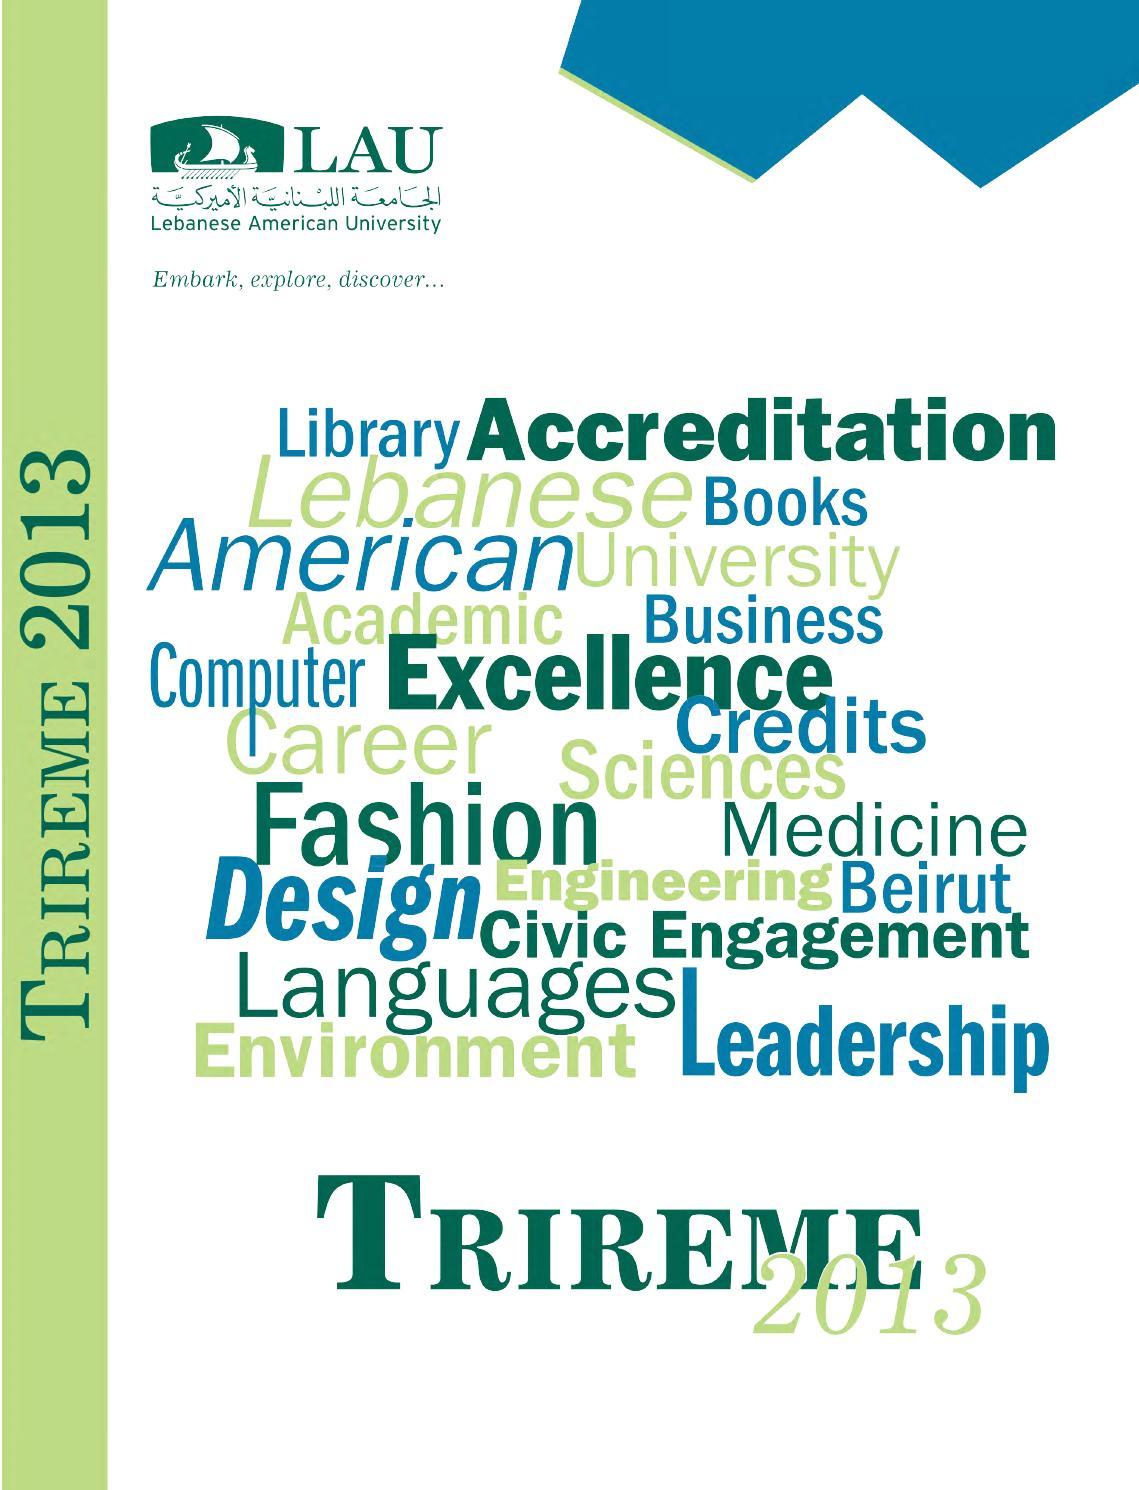 LAU Trireme 2013 by Lebanese American University - issuu